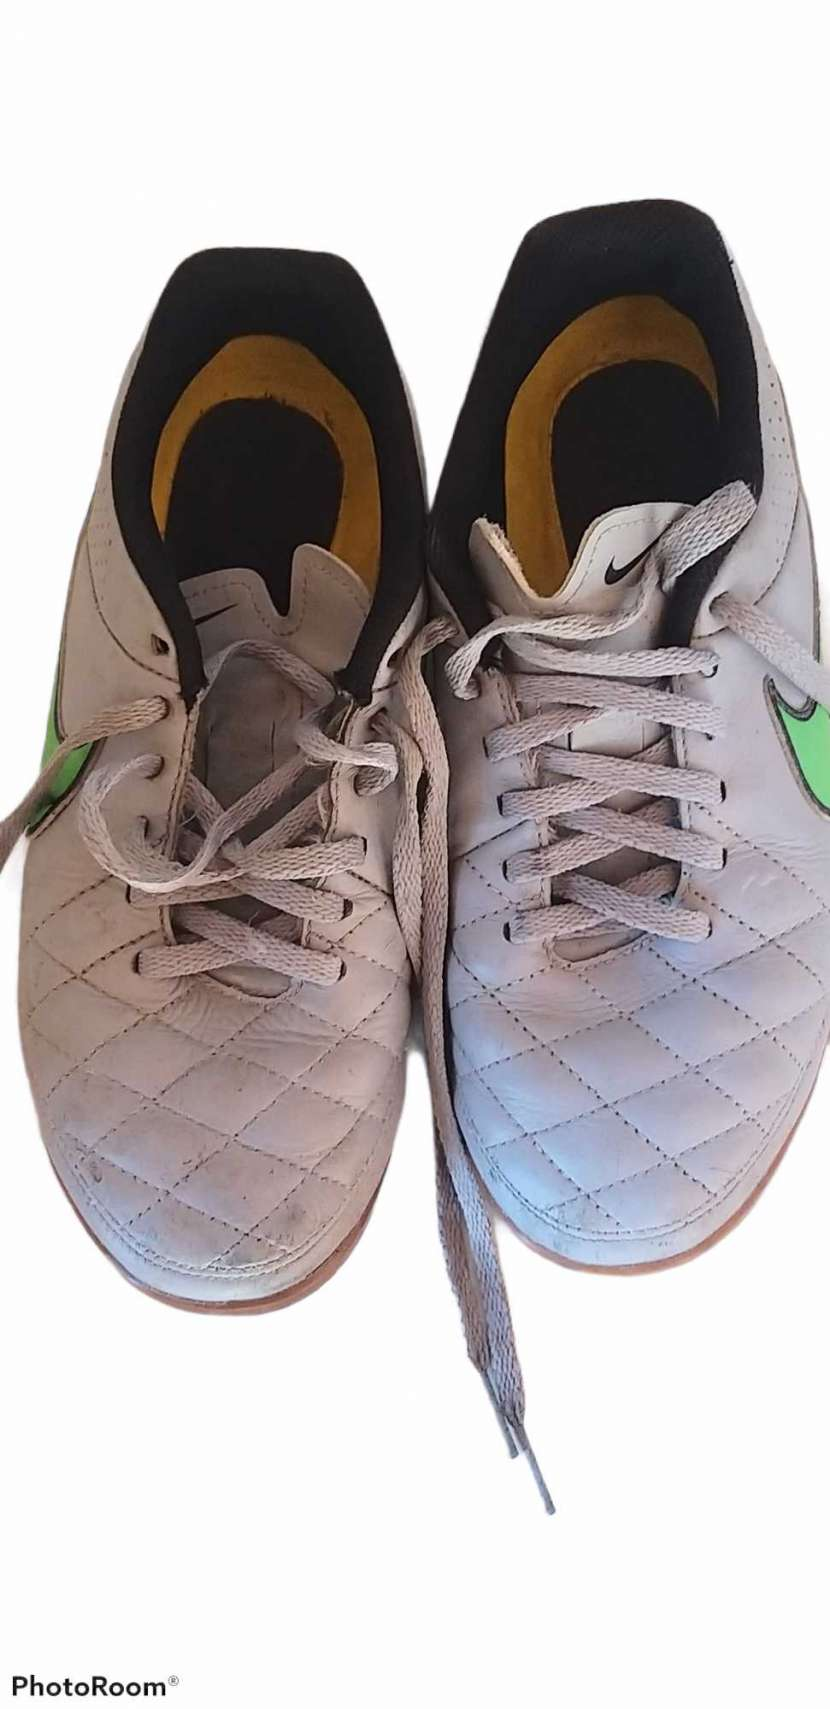 Calzado Nike Tiempo para futsal calce 38 - 0